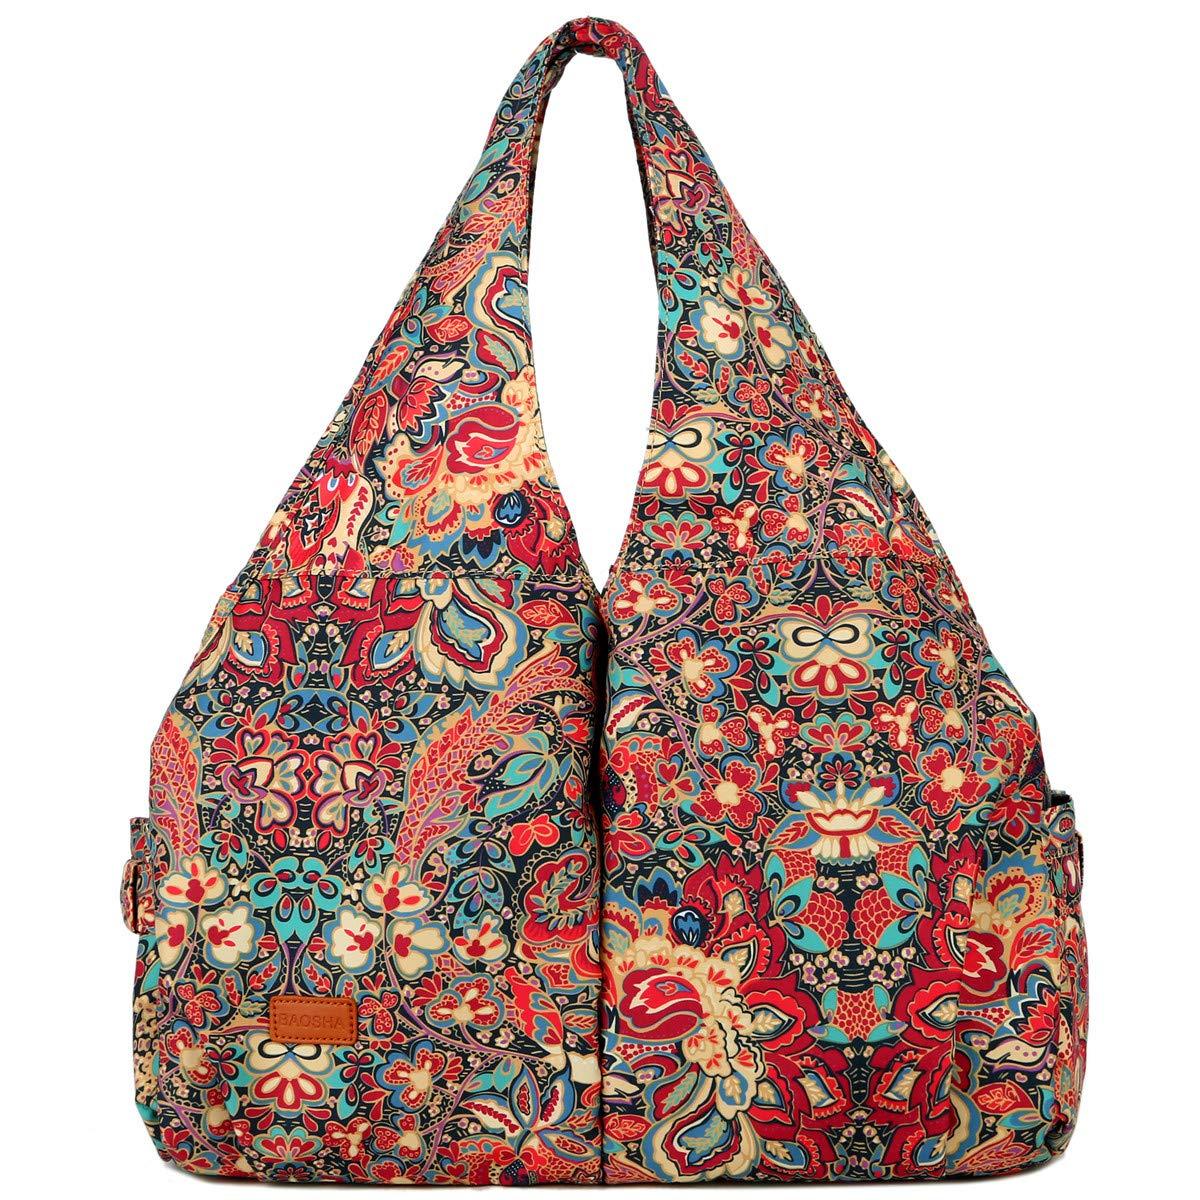 BAOSHA Women Yoga Gym Tote Bag Shopping Shoulder Bag Hangbag Muilti pockets Lightweight TB-07 (HS)